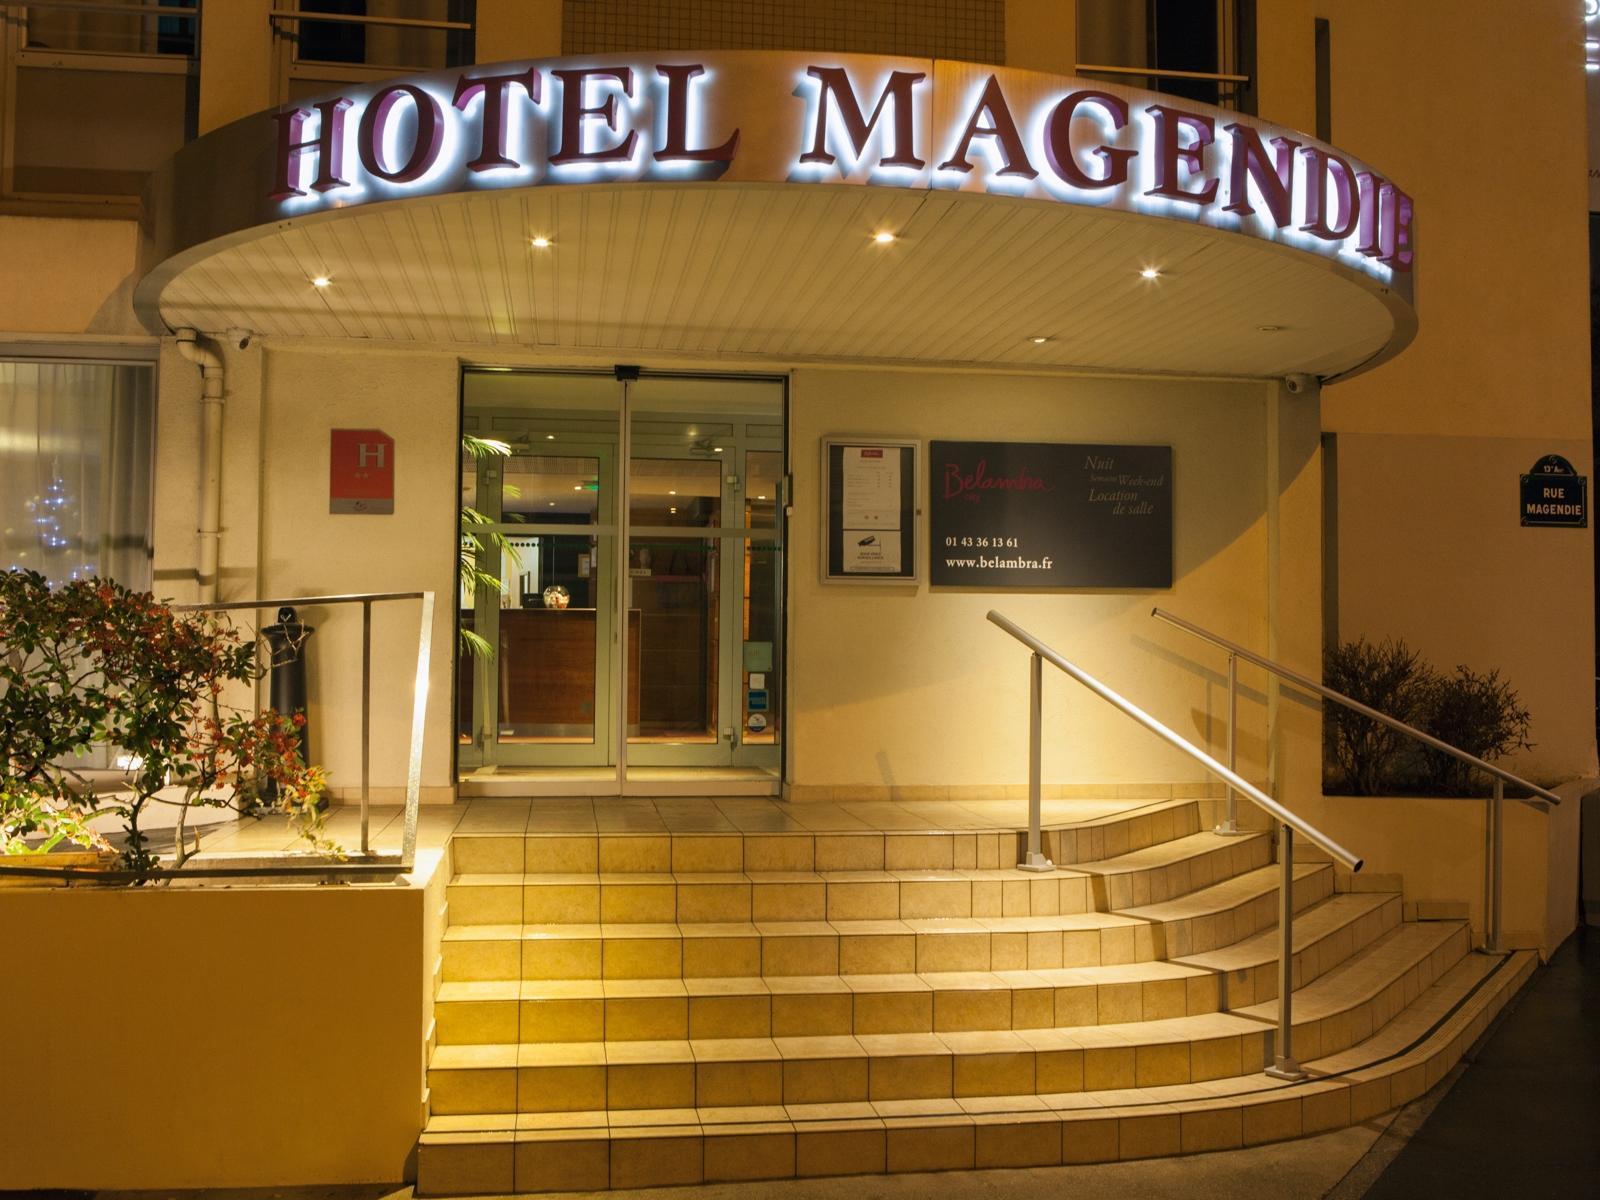 Belambra City Hotel Magendie